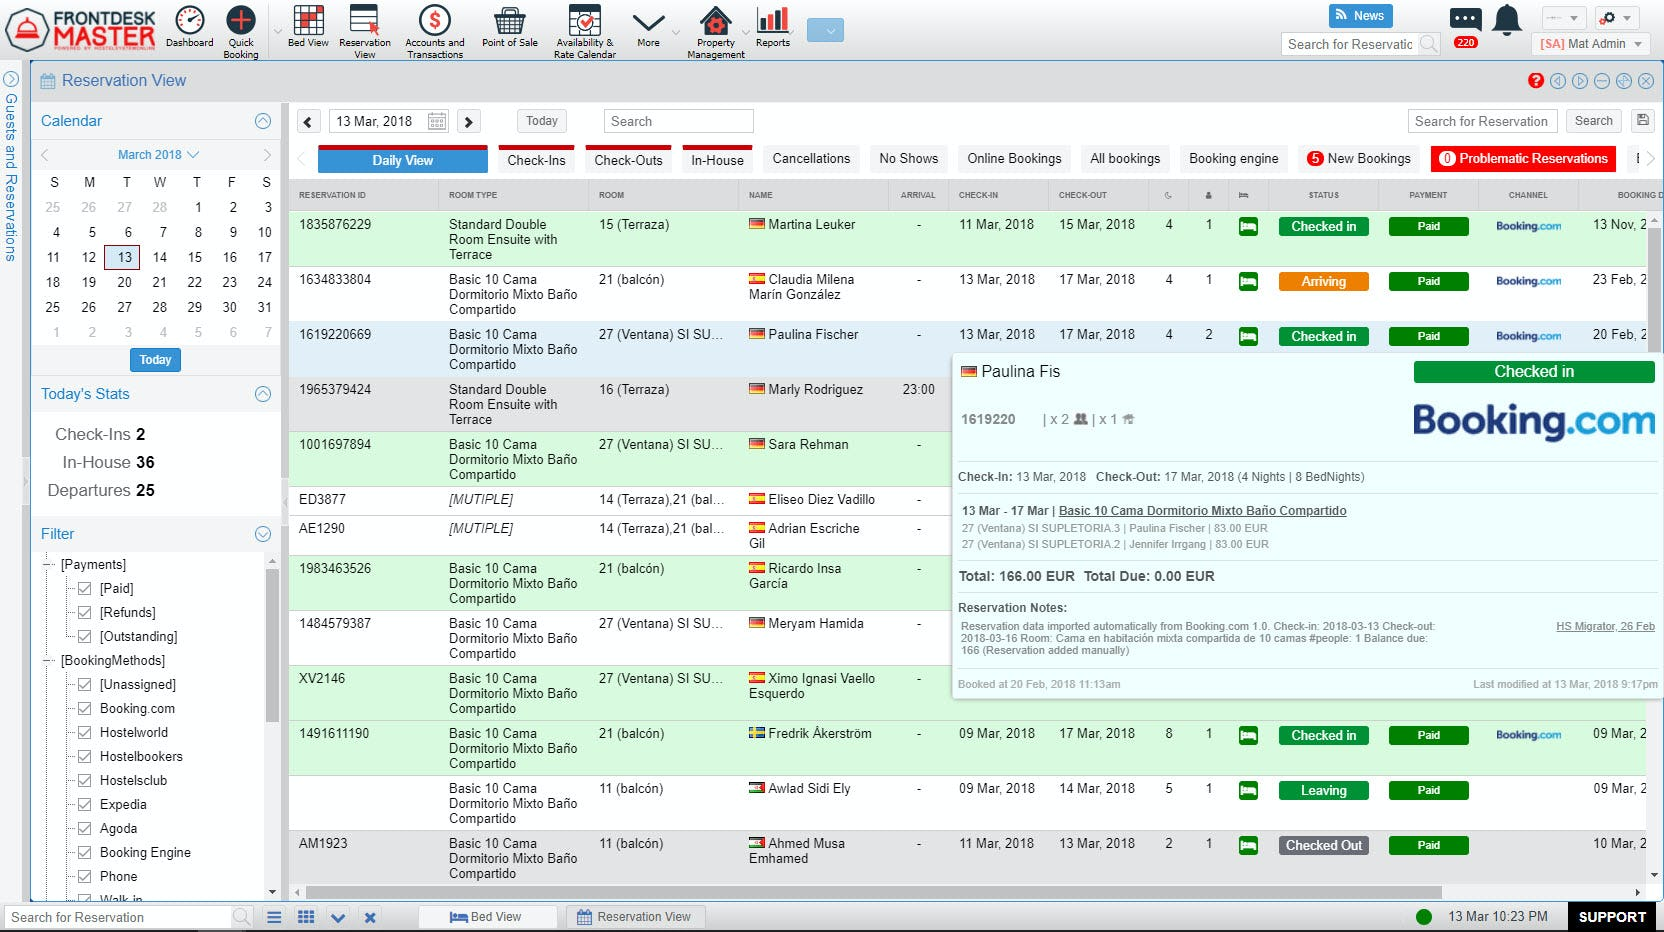 FrontDesk Master Software - Reservation view